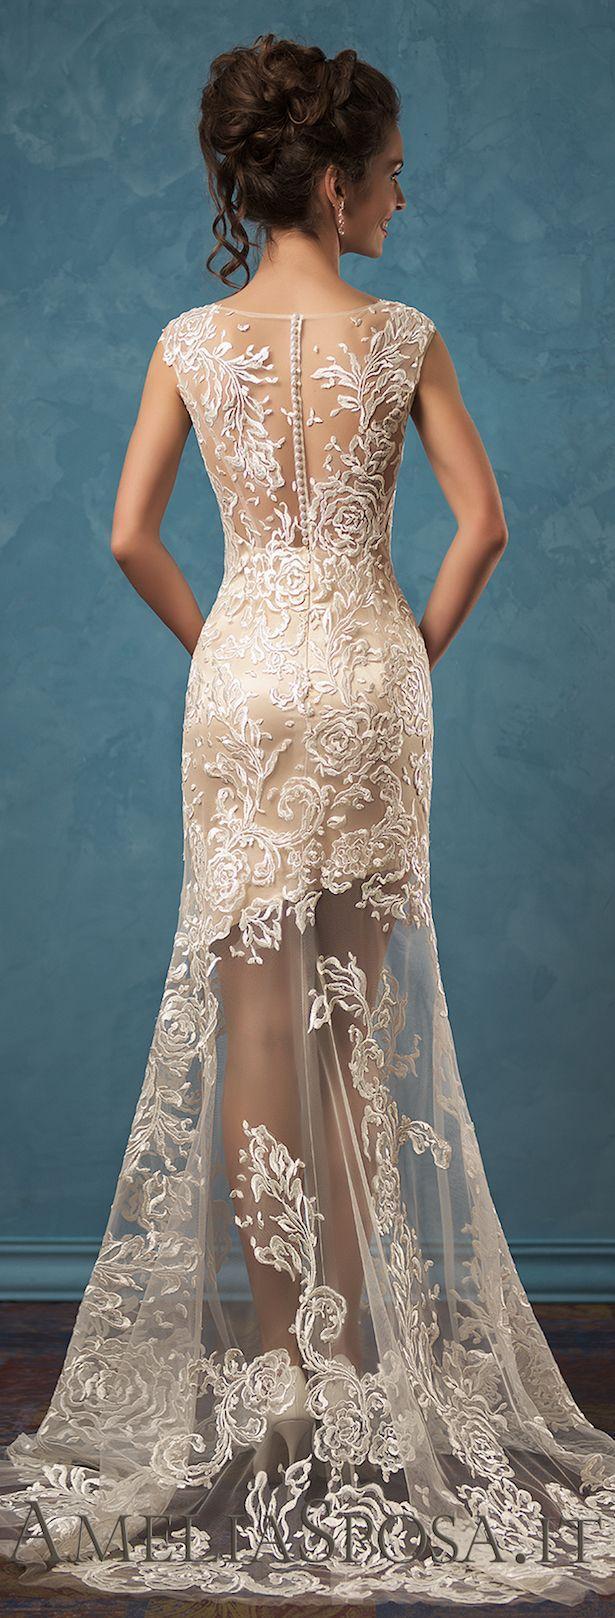 Wedding - Amelia Sposa 2017 Wedding Dresses